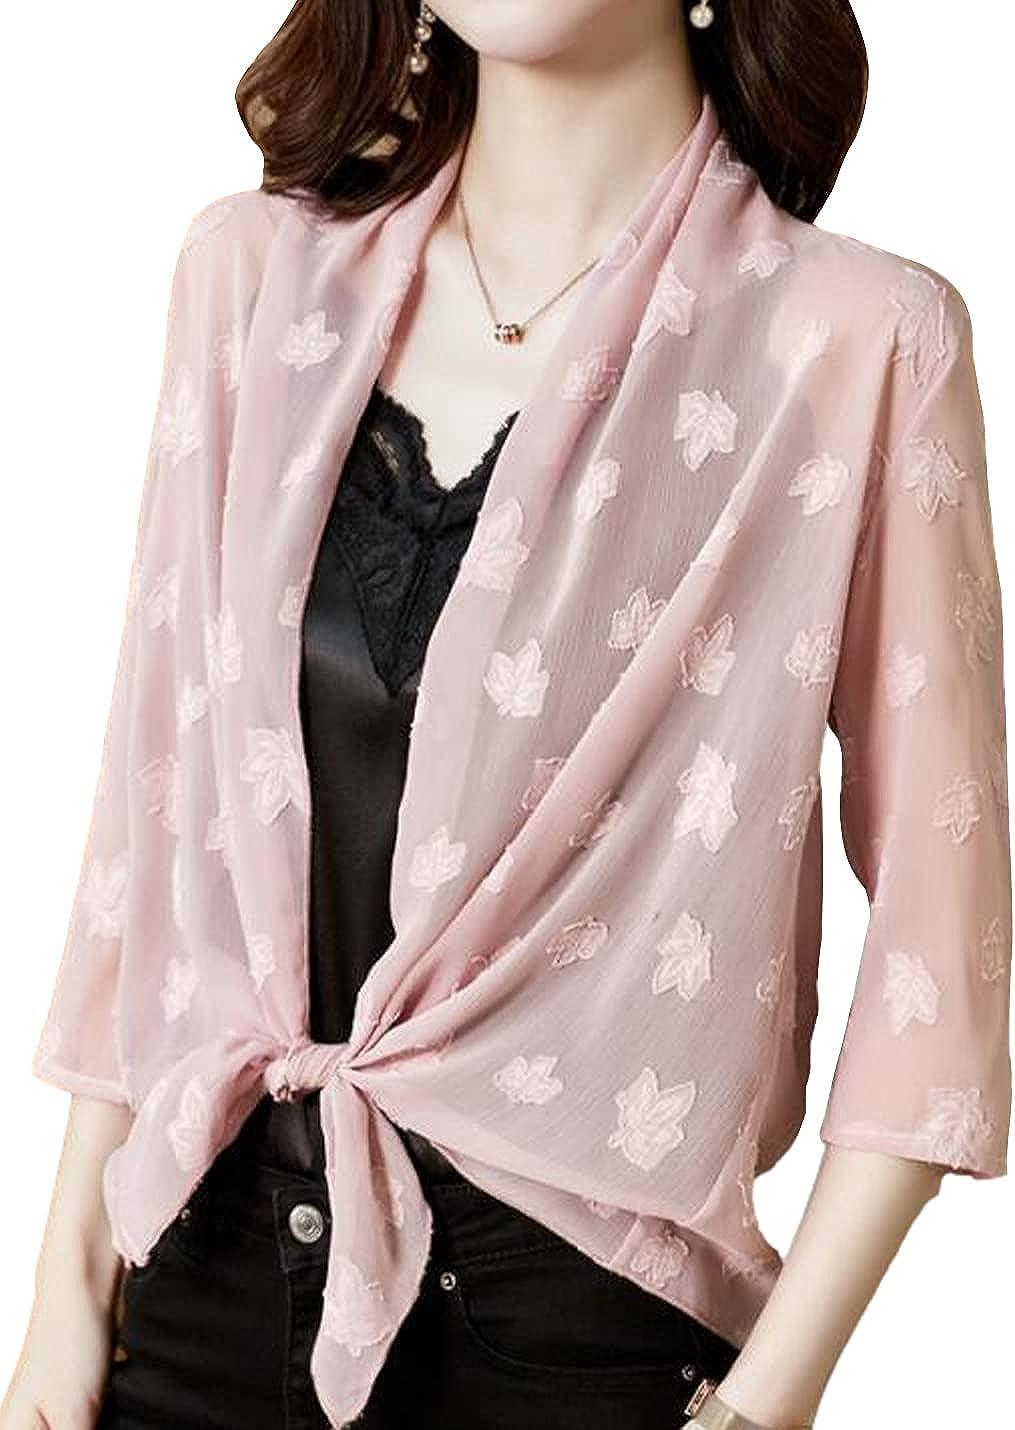 Xishiloft Women's Casual Chiffon Jacquard Shawl Jacket 3/4 Sleeve Waist Belt Shrug Cardigan